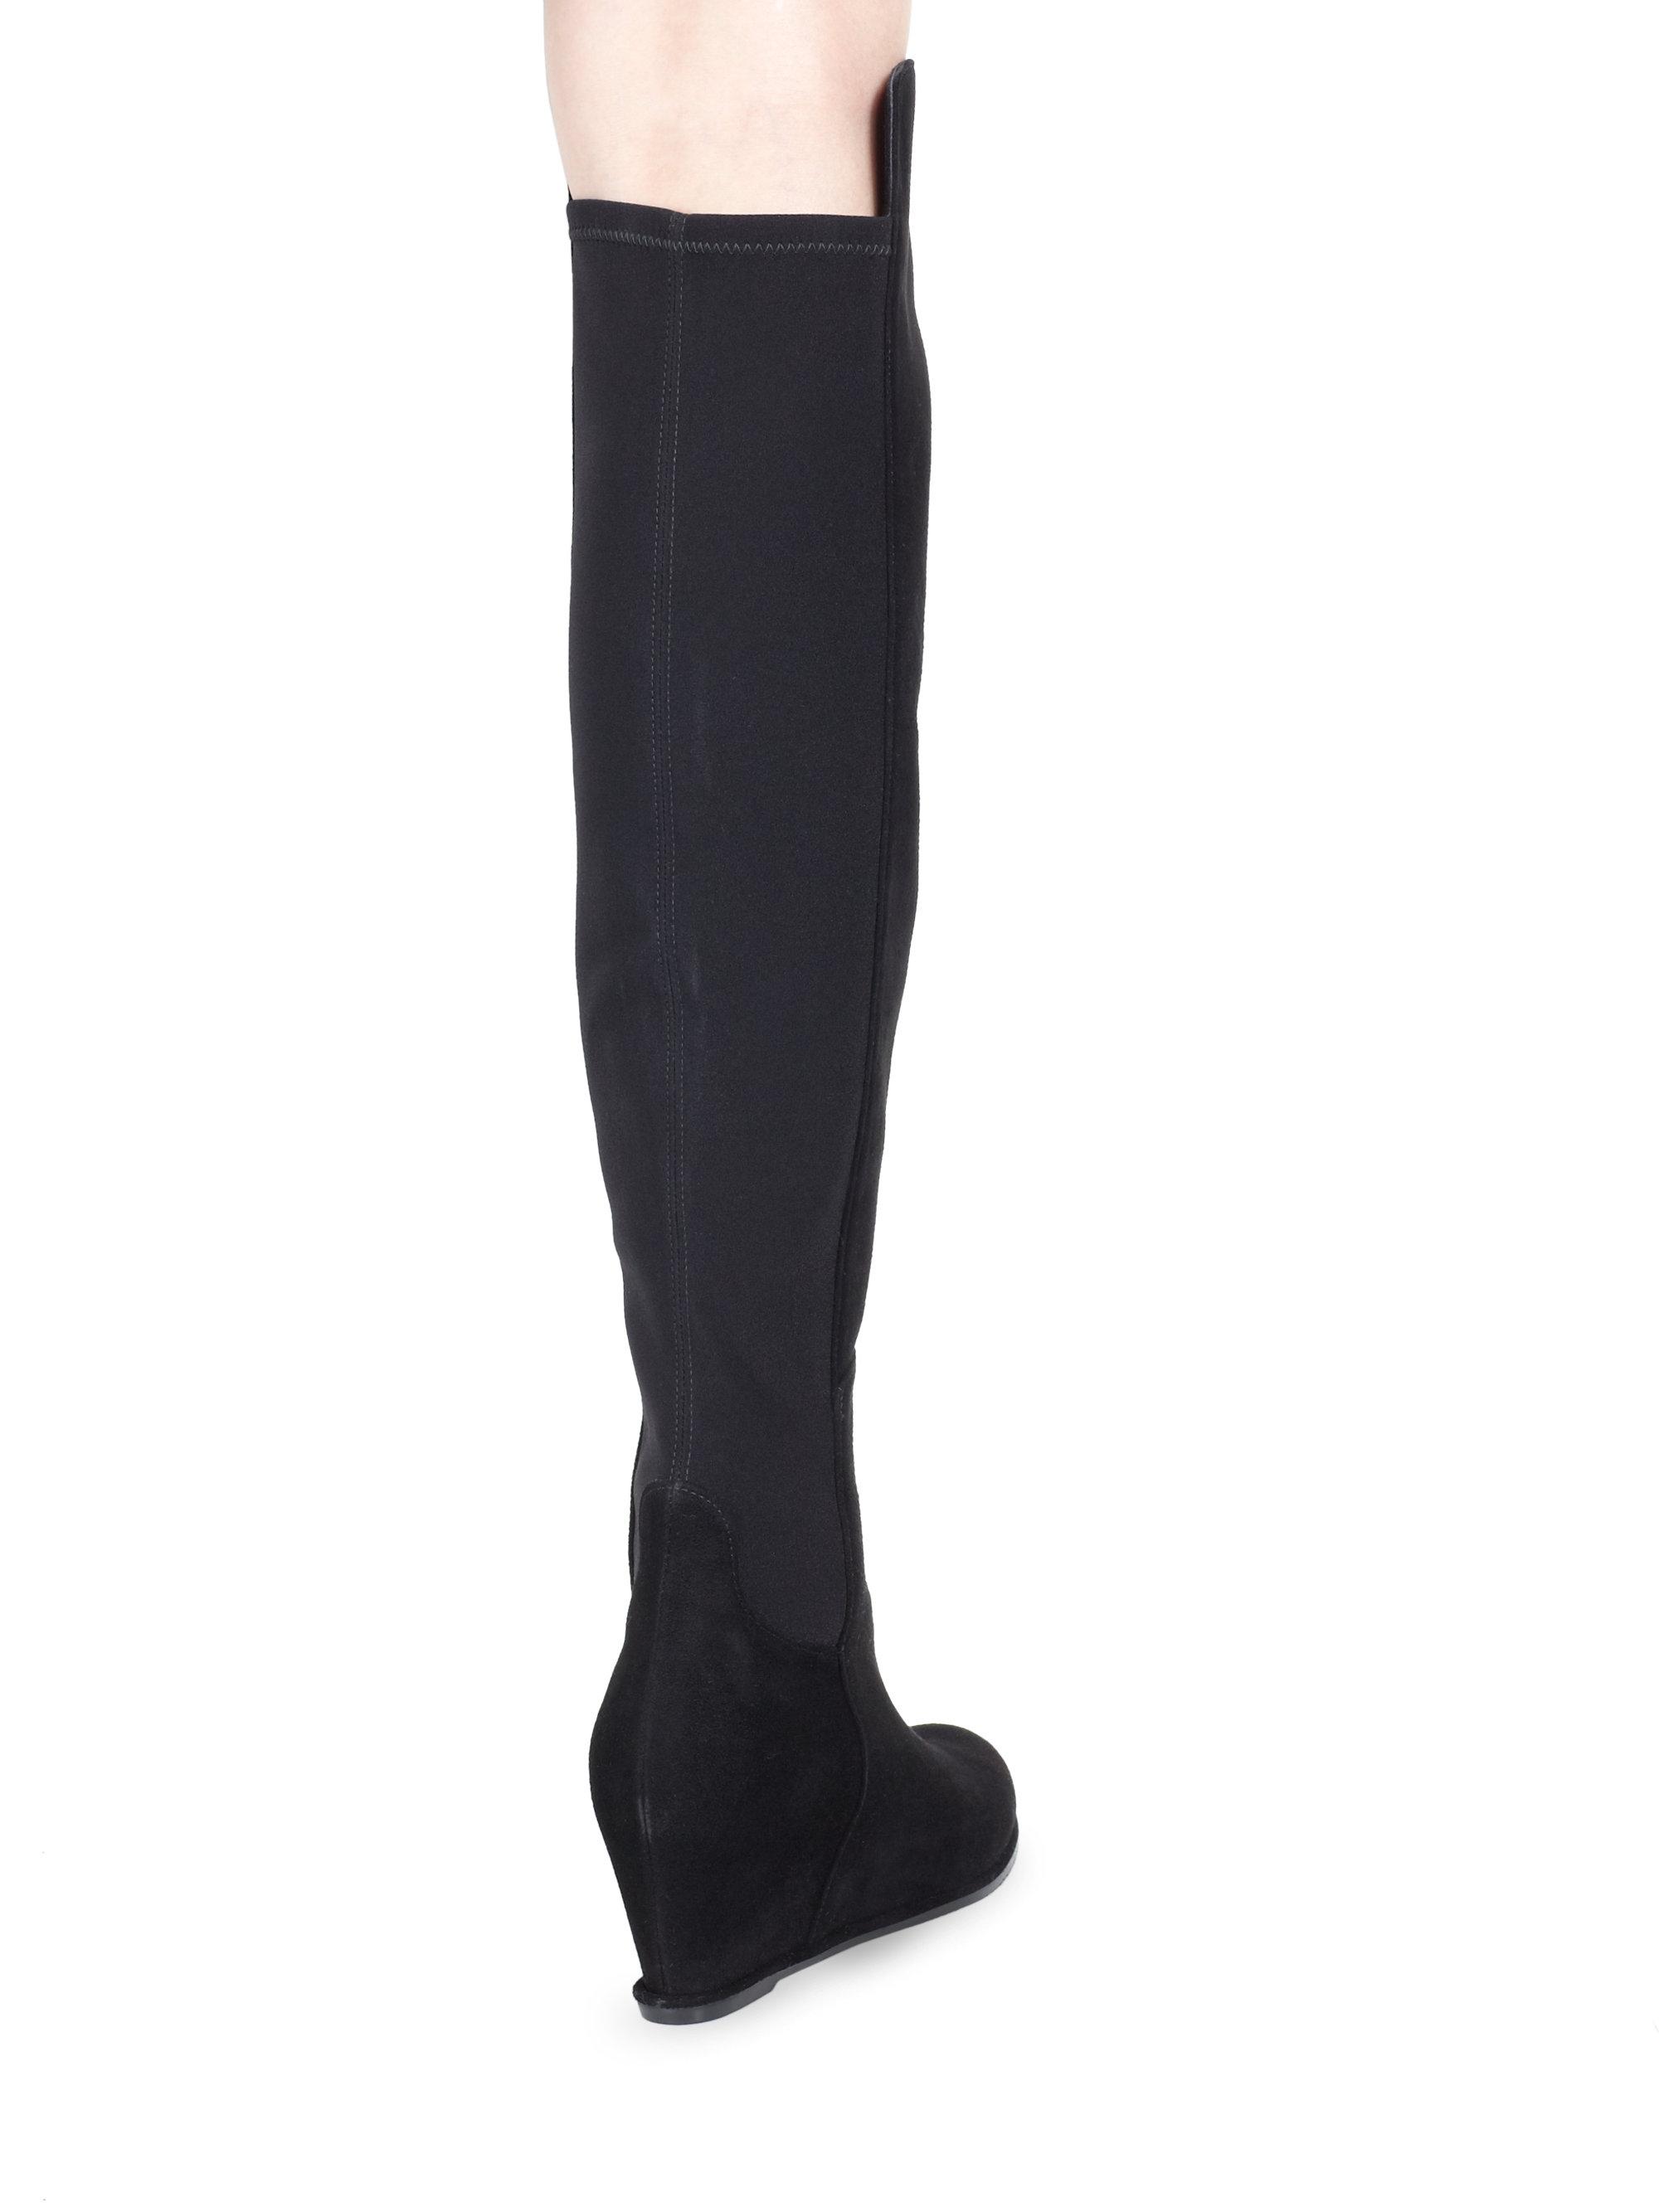 326d39da3e3 Lyst - Stuart Weitzman Suede Over-the-knee Wedge Boots in Black